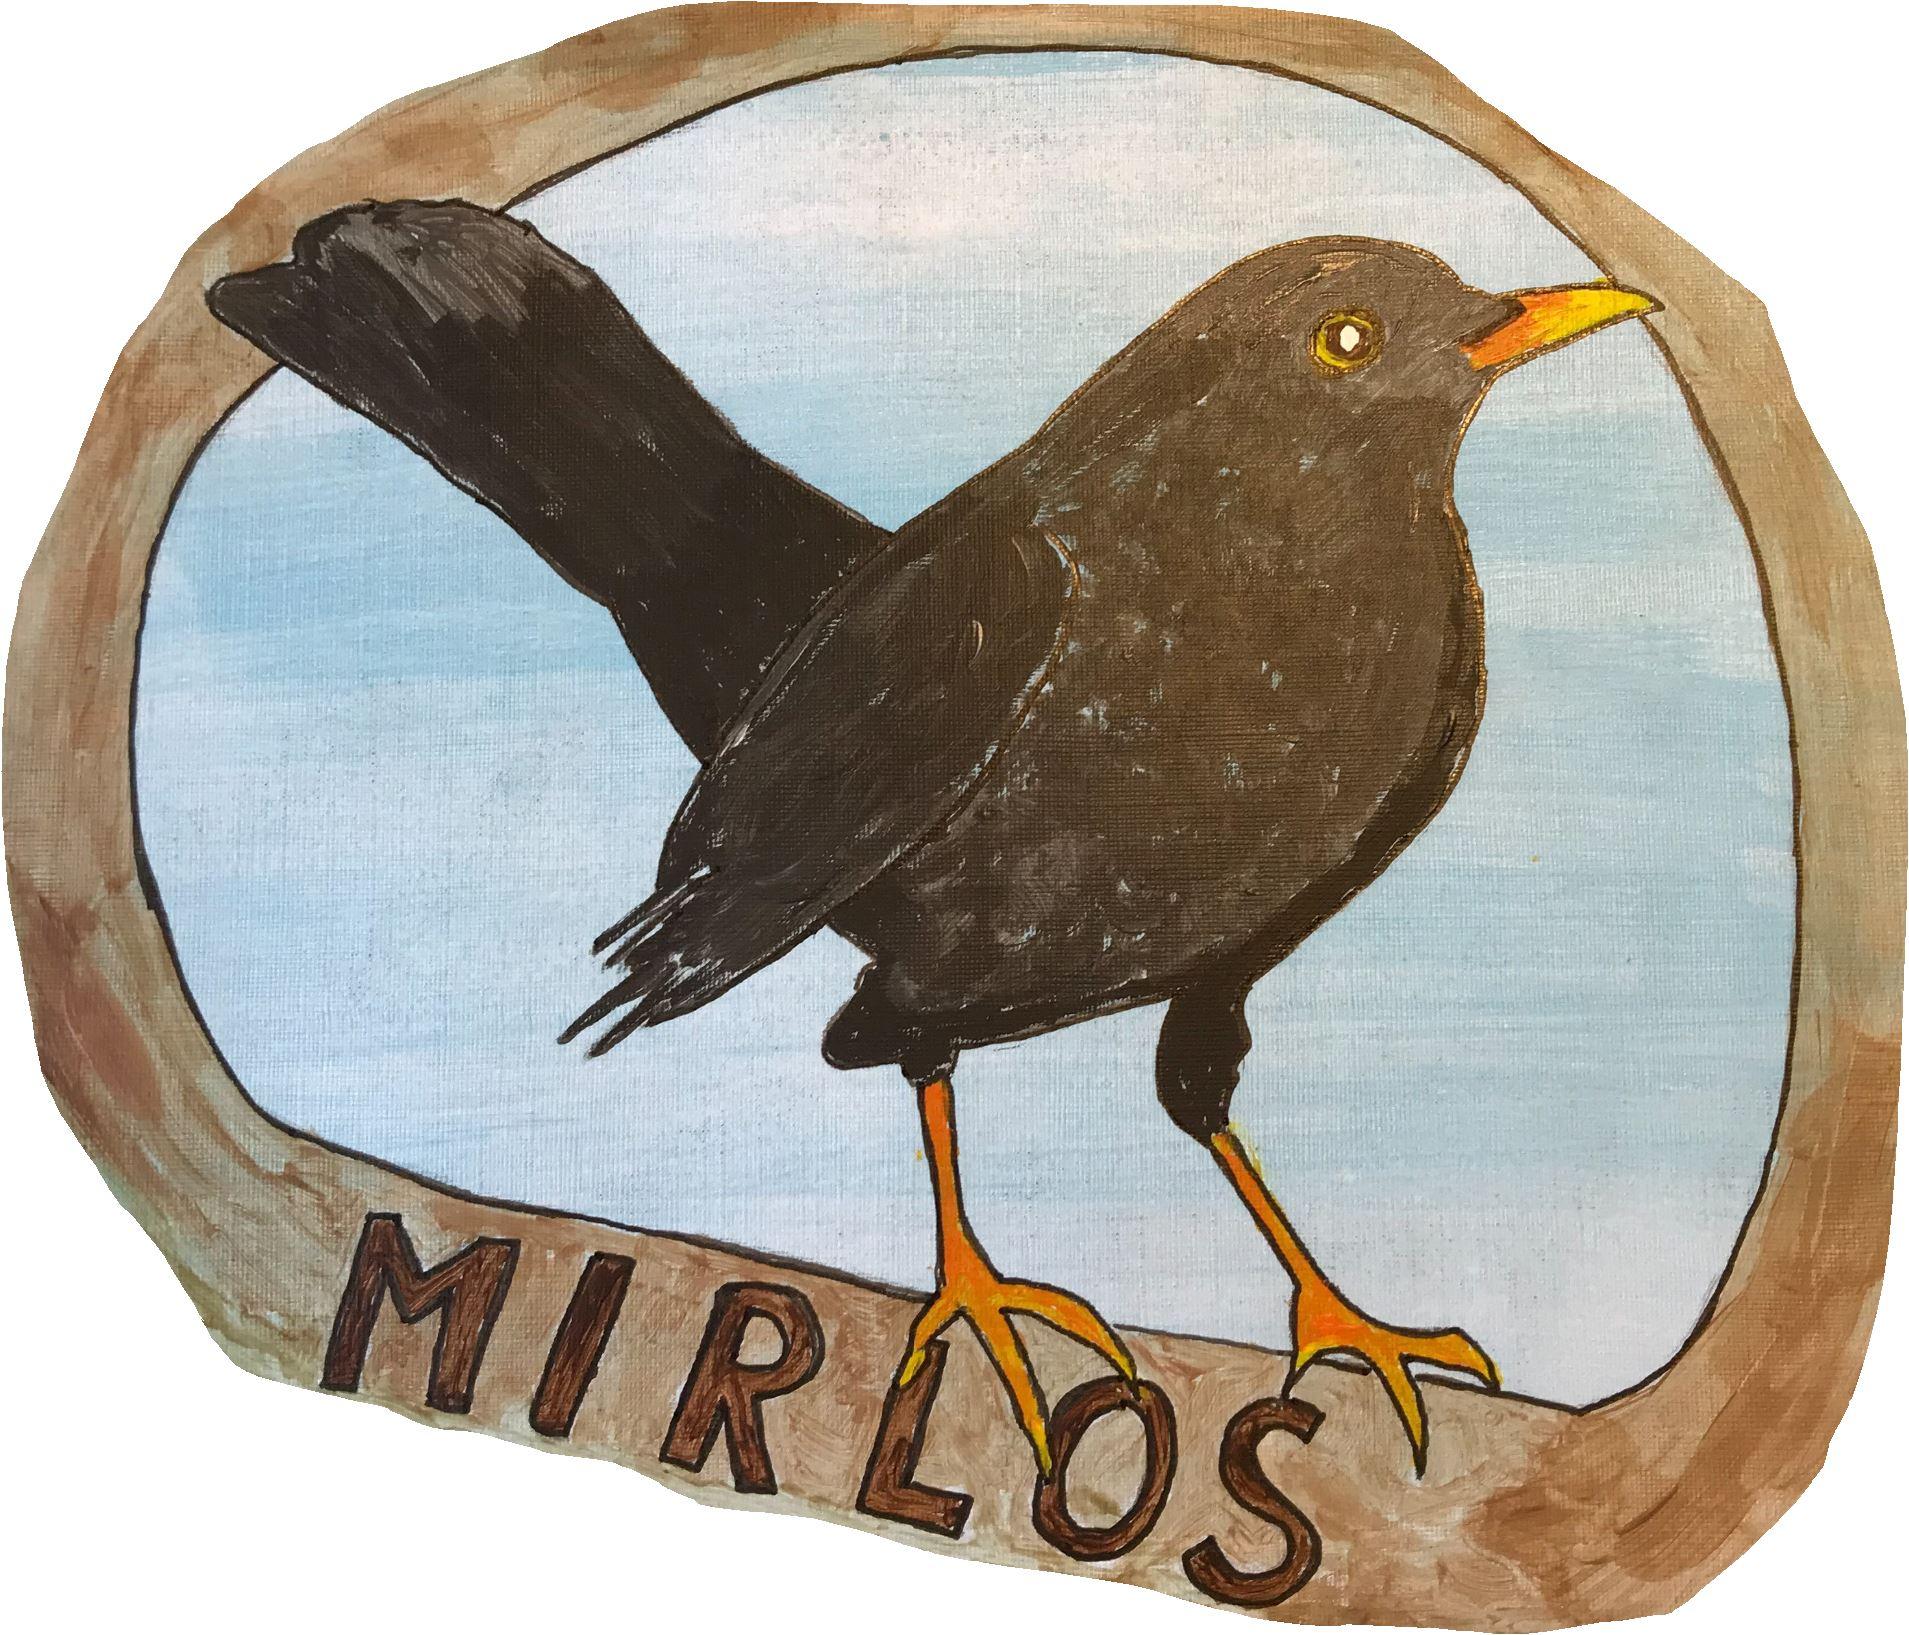 Mirlos Properties Limited